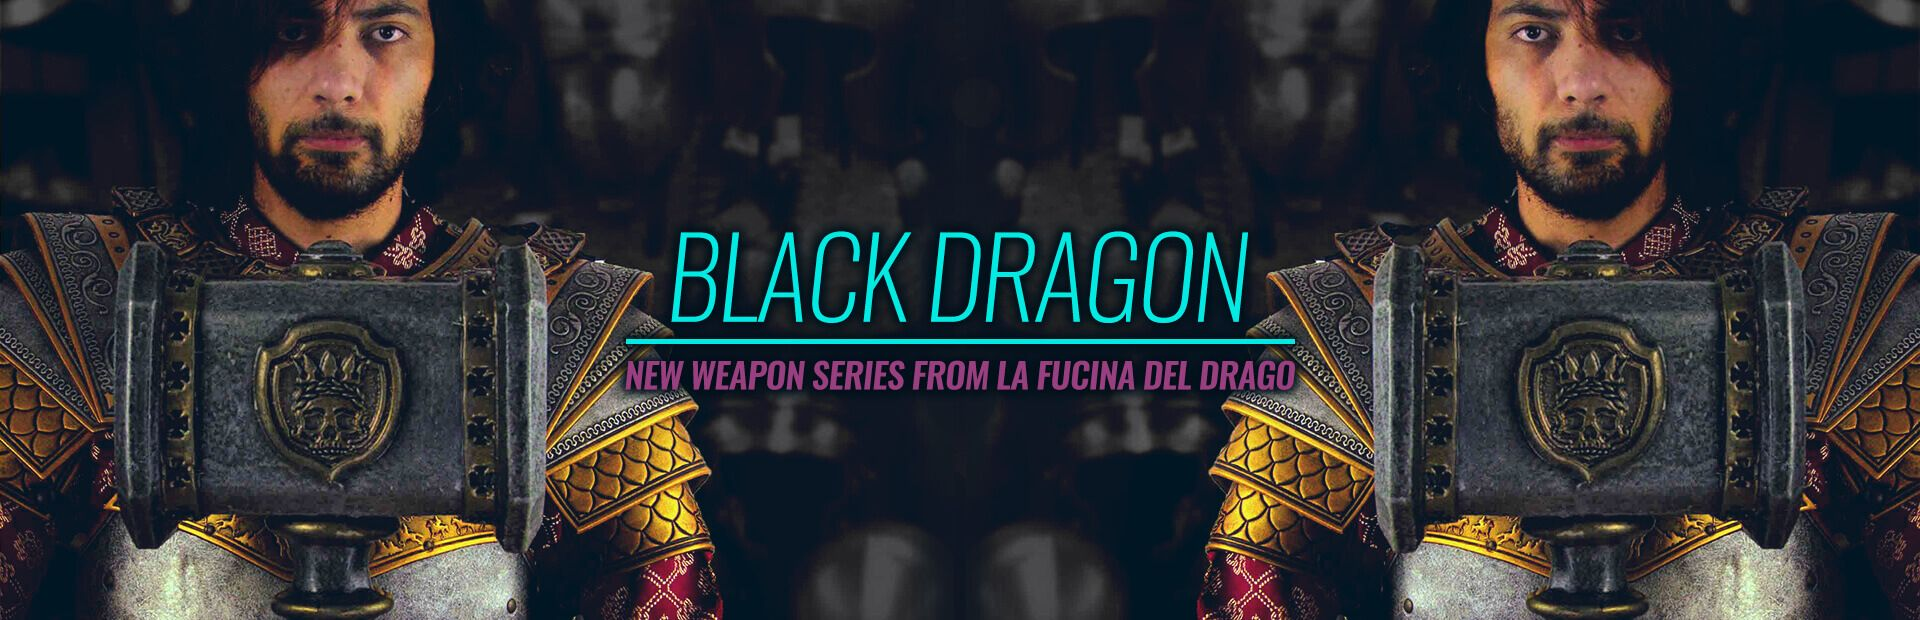 https://www.5zywiolow.com/shop/en/manufacturer/fucina-del-drago